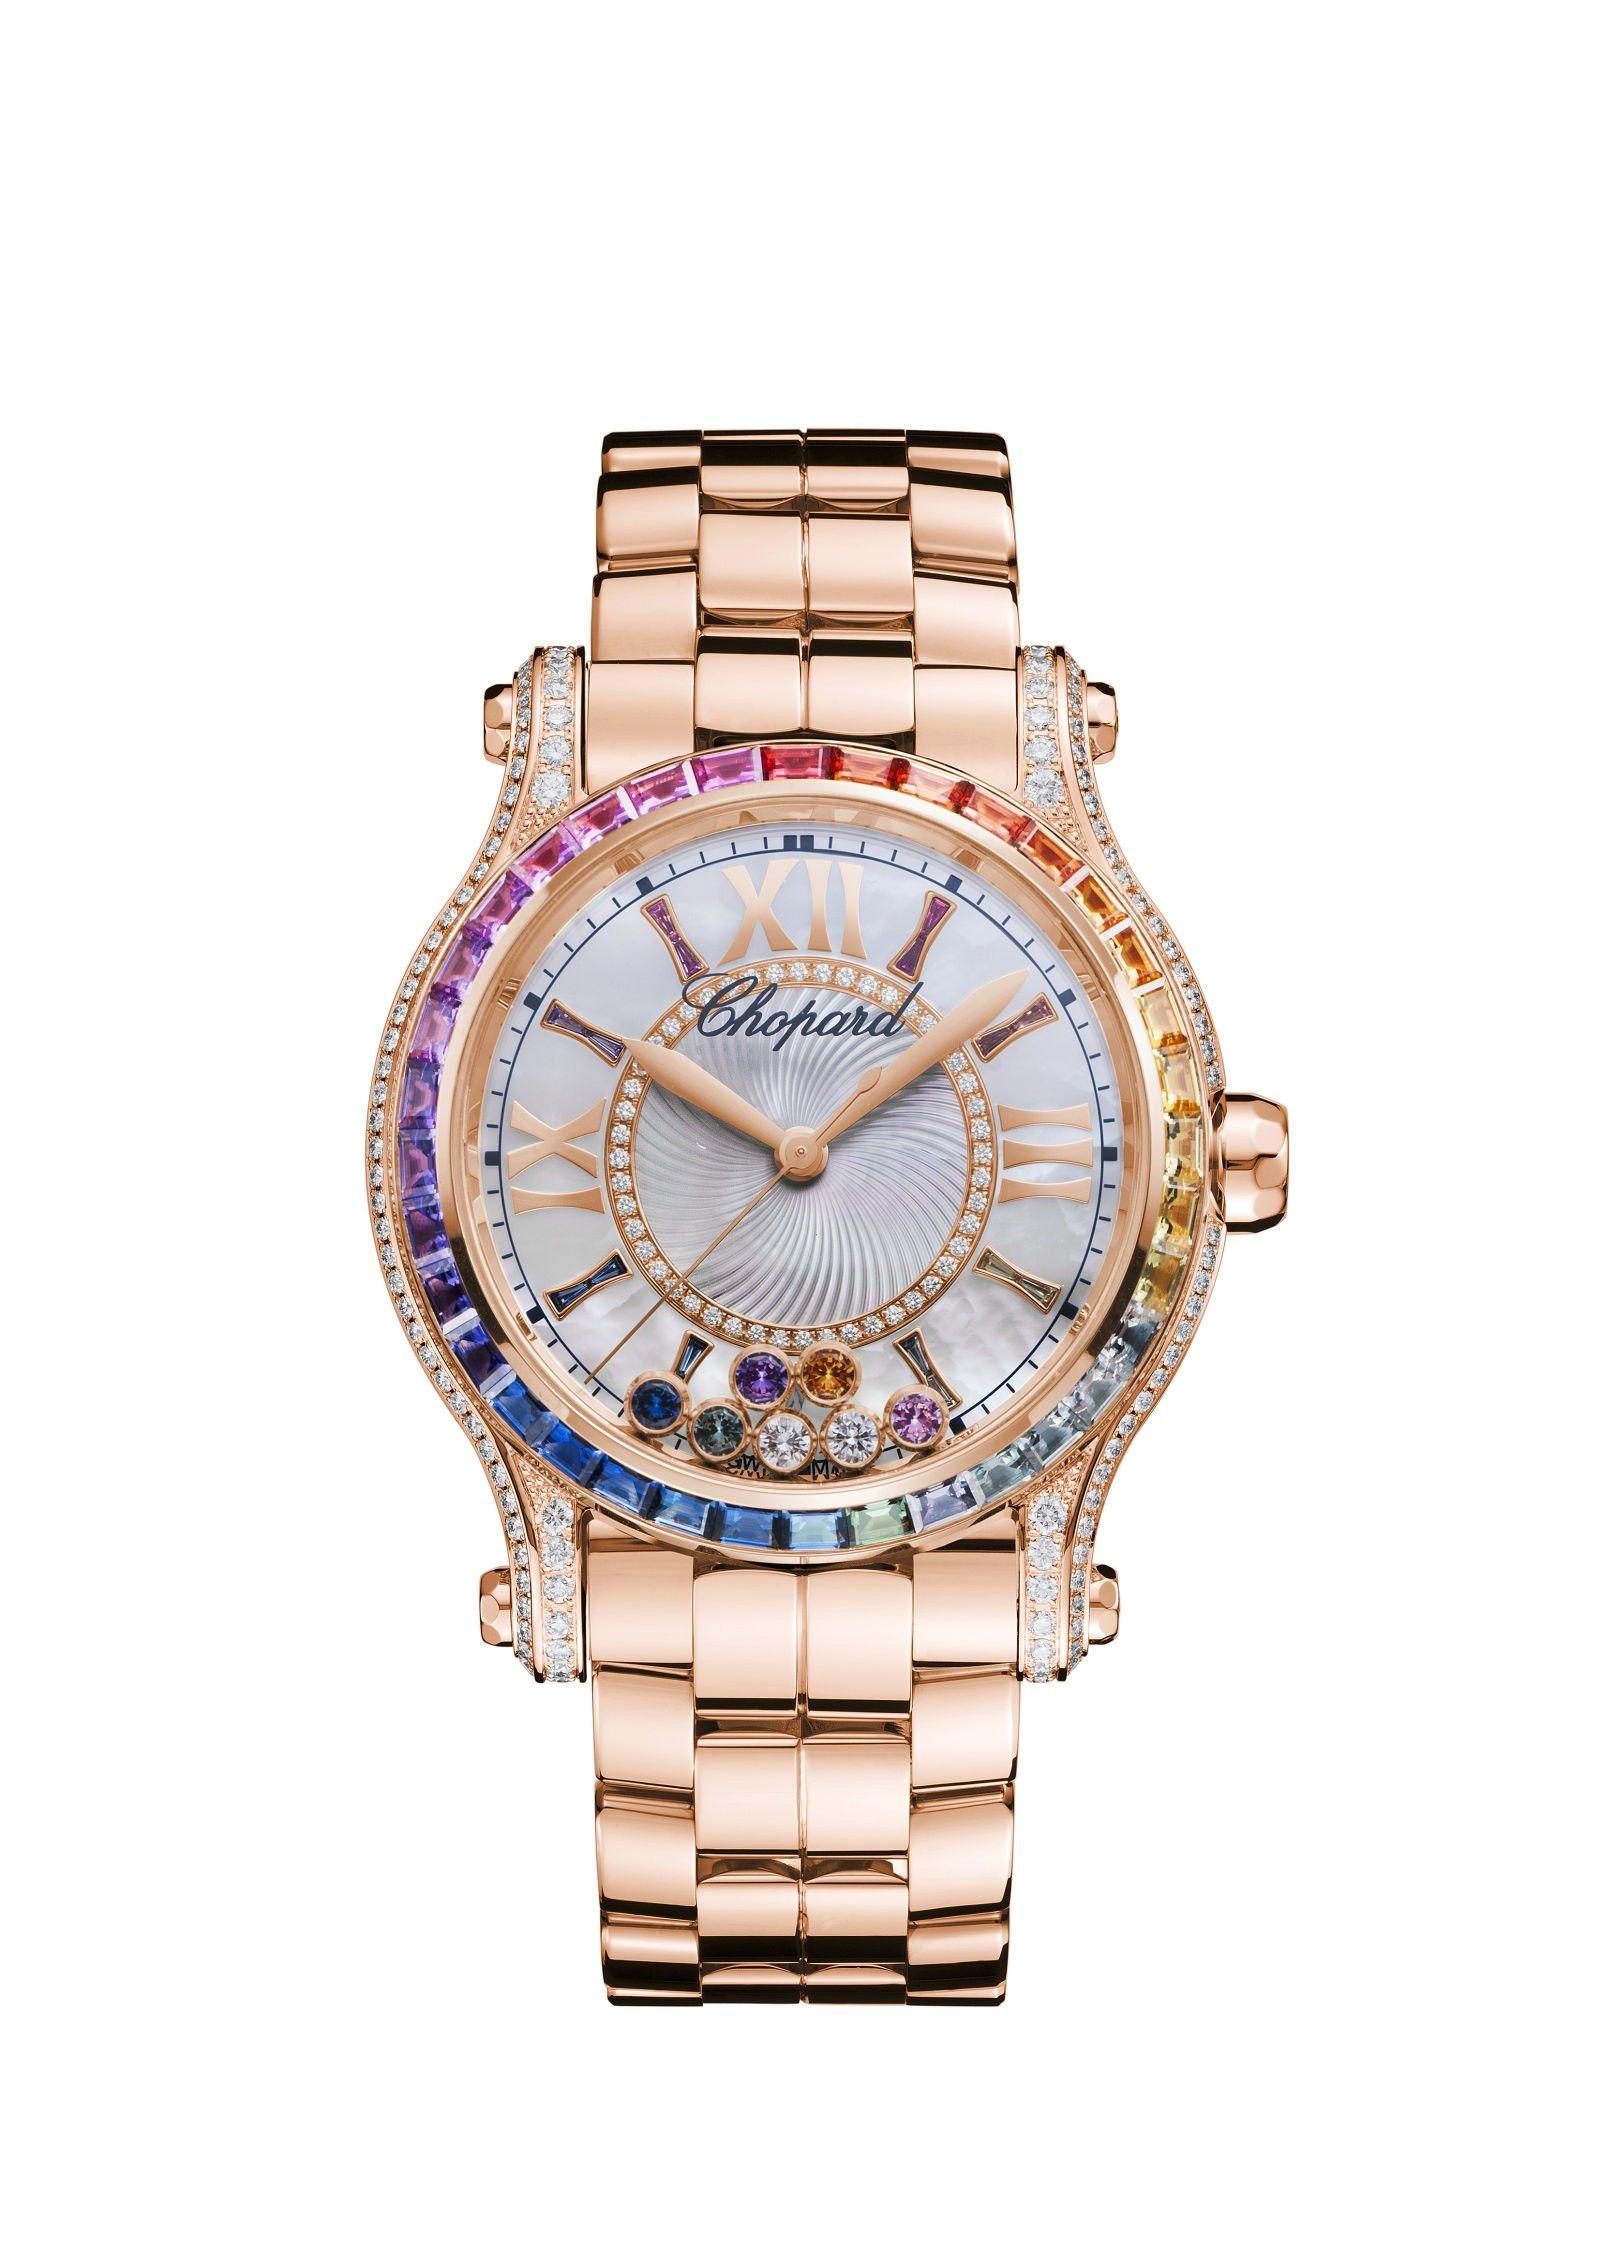 387bc8b6170 Happy Sport 36 MM Automatic Watch so beautiful   fun. Chopard the classier  Rolex. Rainbow saphires ❤️